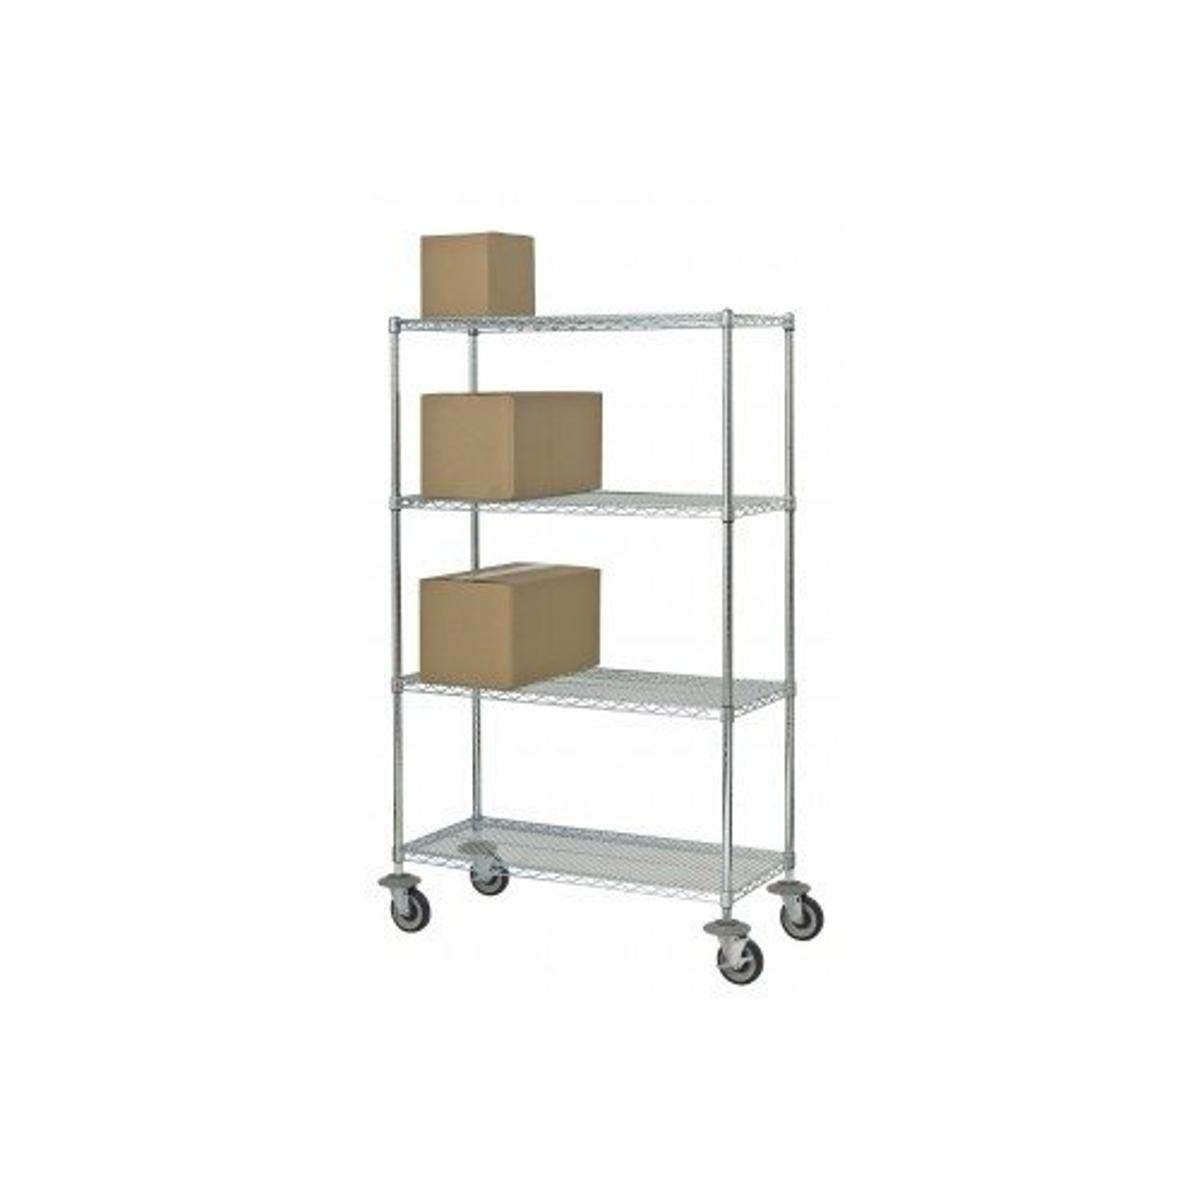 Focus Ranking TOP20 Foodservice FMK2148695CH Mobile Stem Gifts Shelf Cart Caster 5